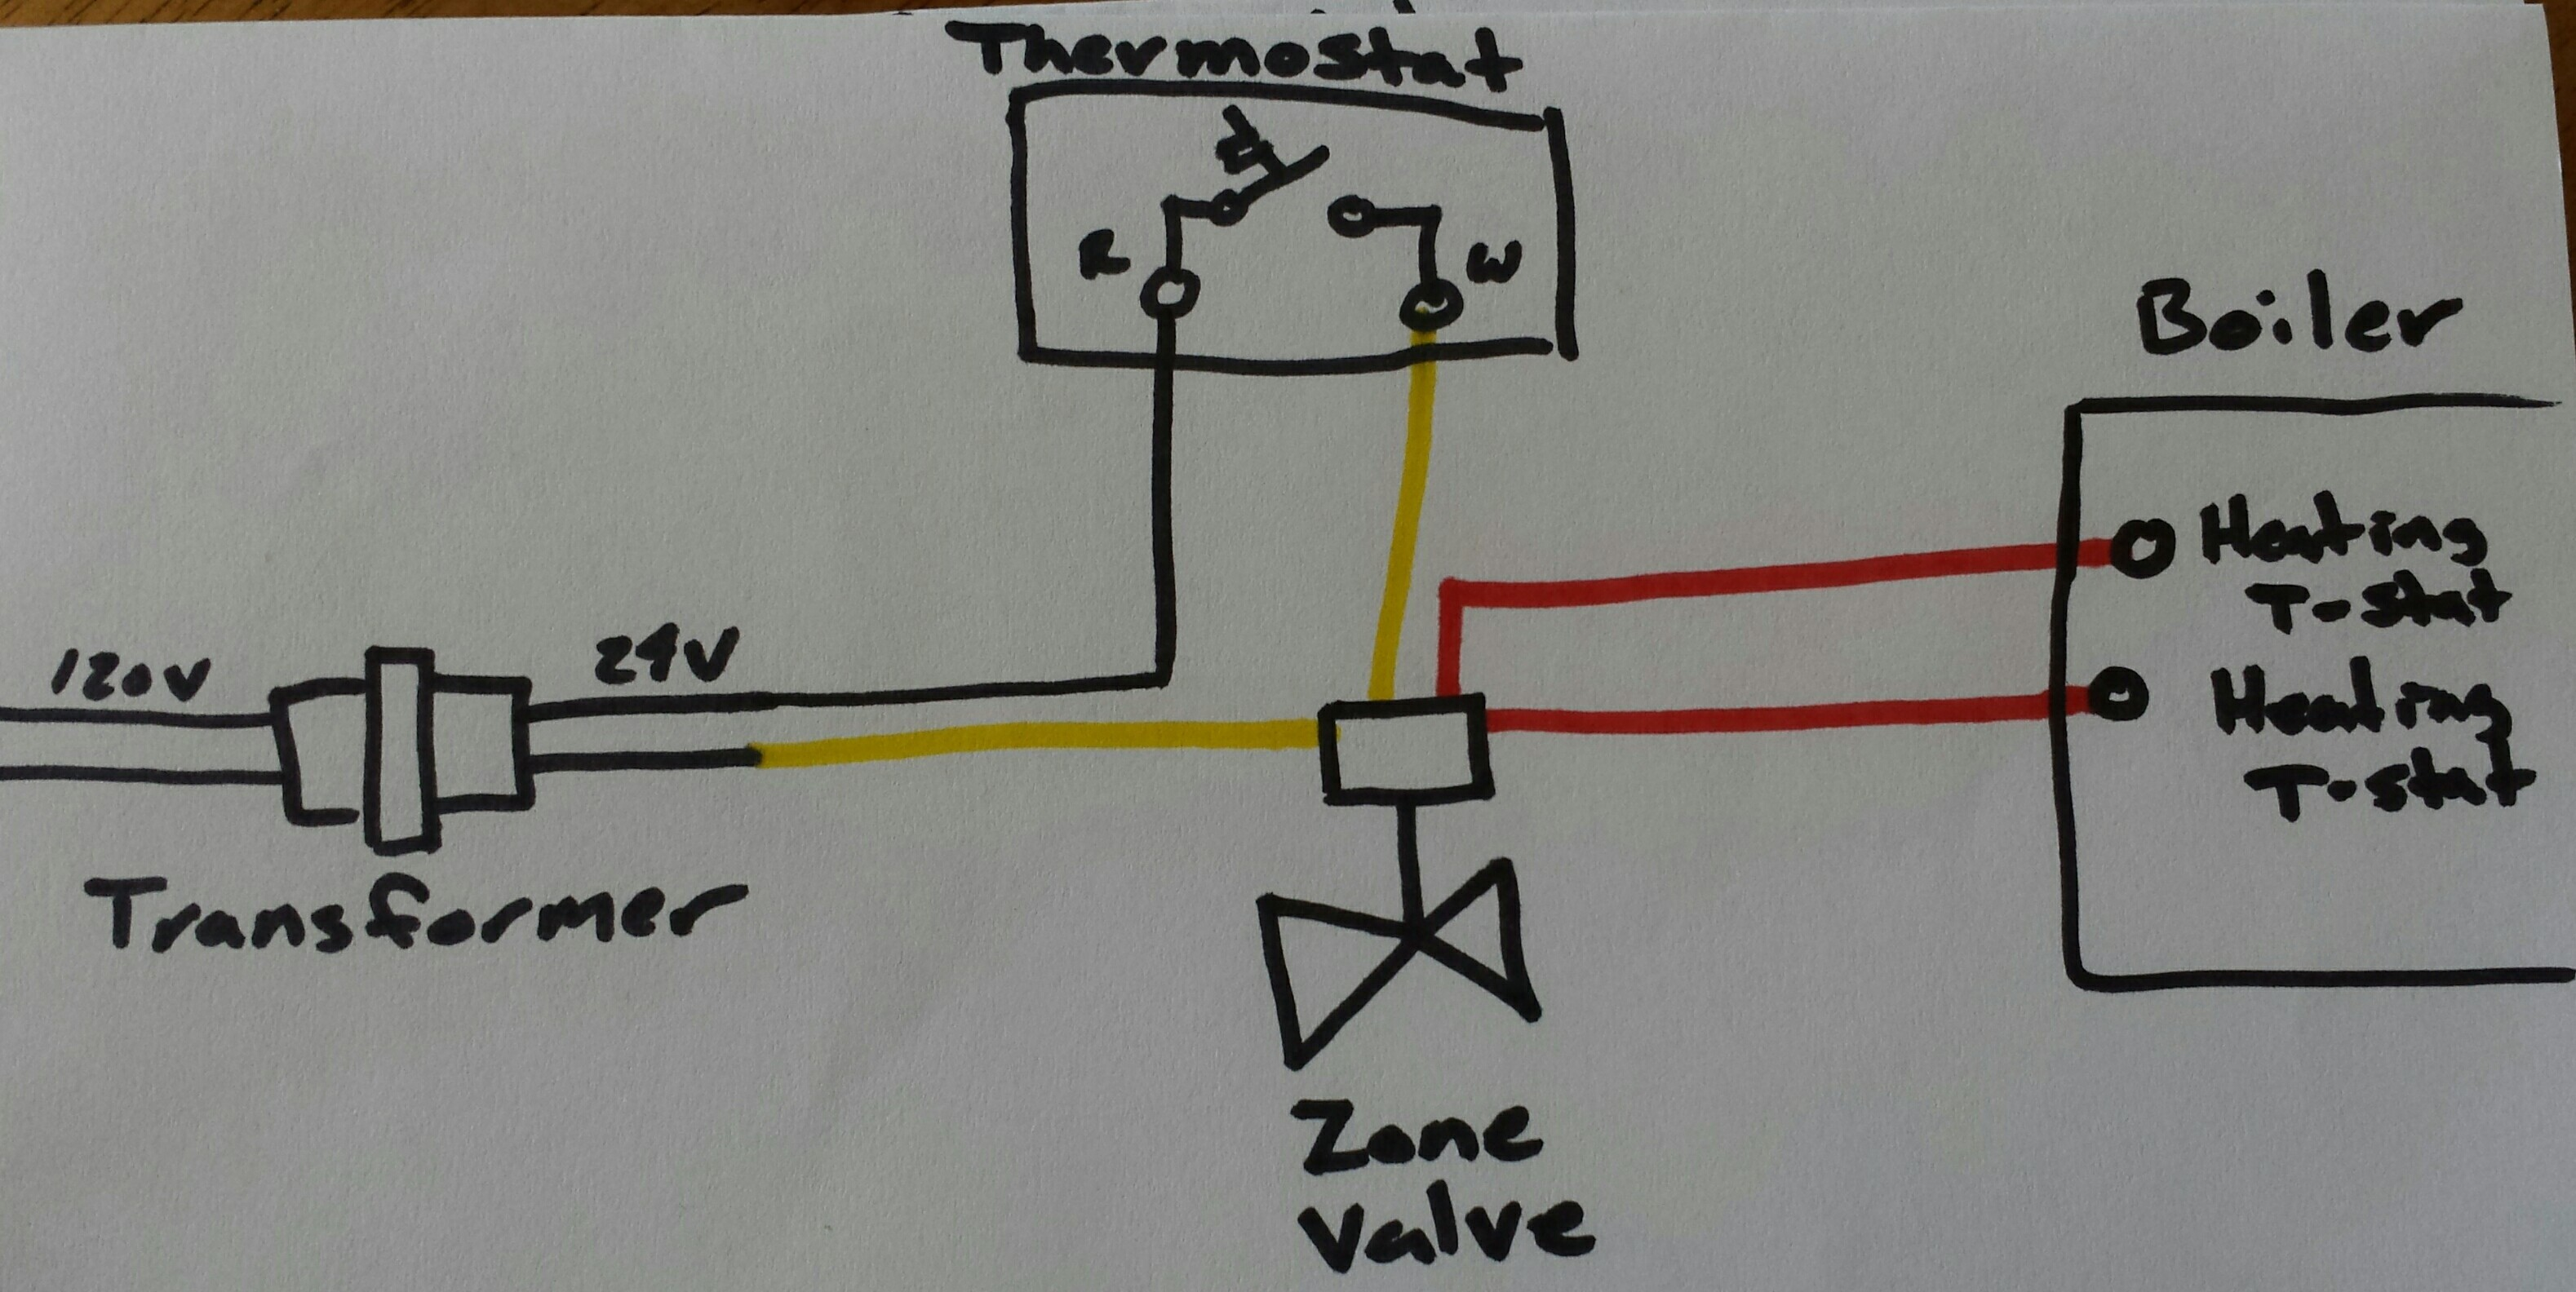 Hk 9124 Zone Valve Wiring Diagram On Honeywell Motorized Valve Wiring Diagram Free Diagram